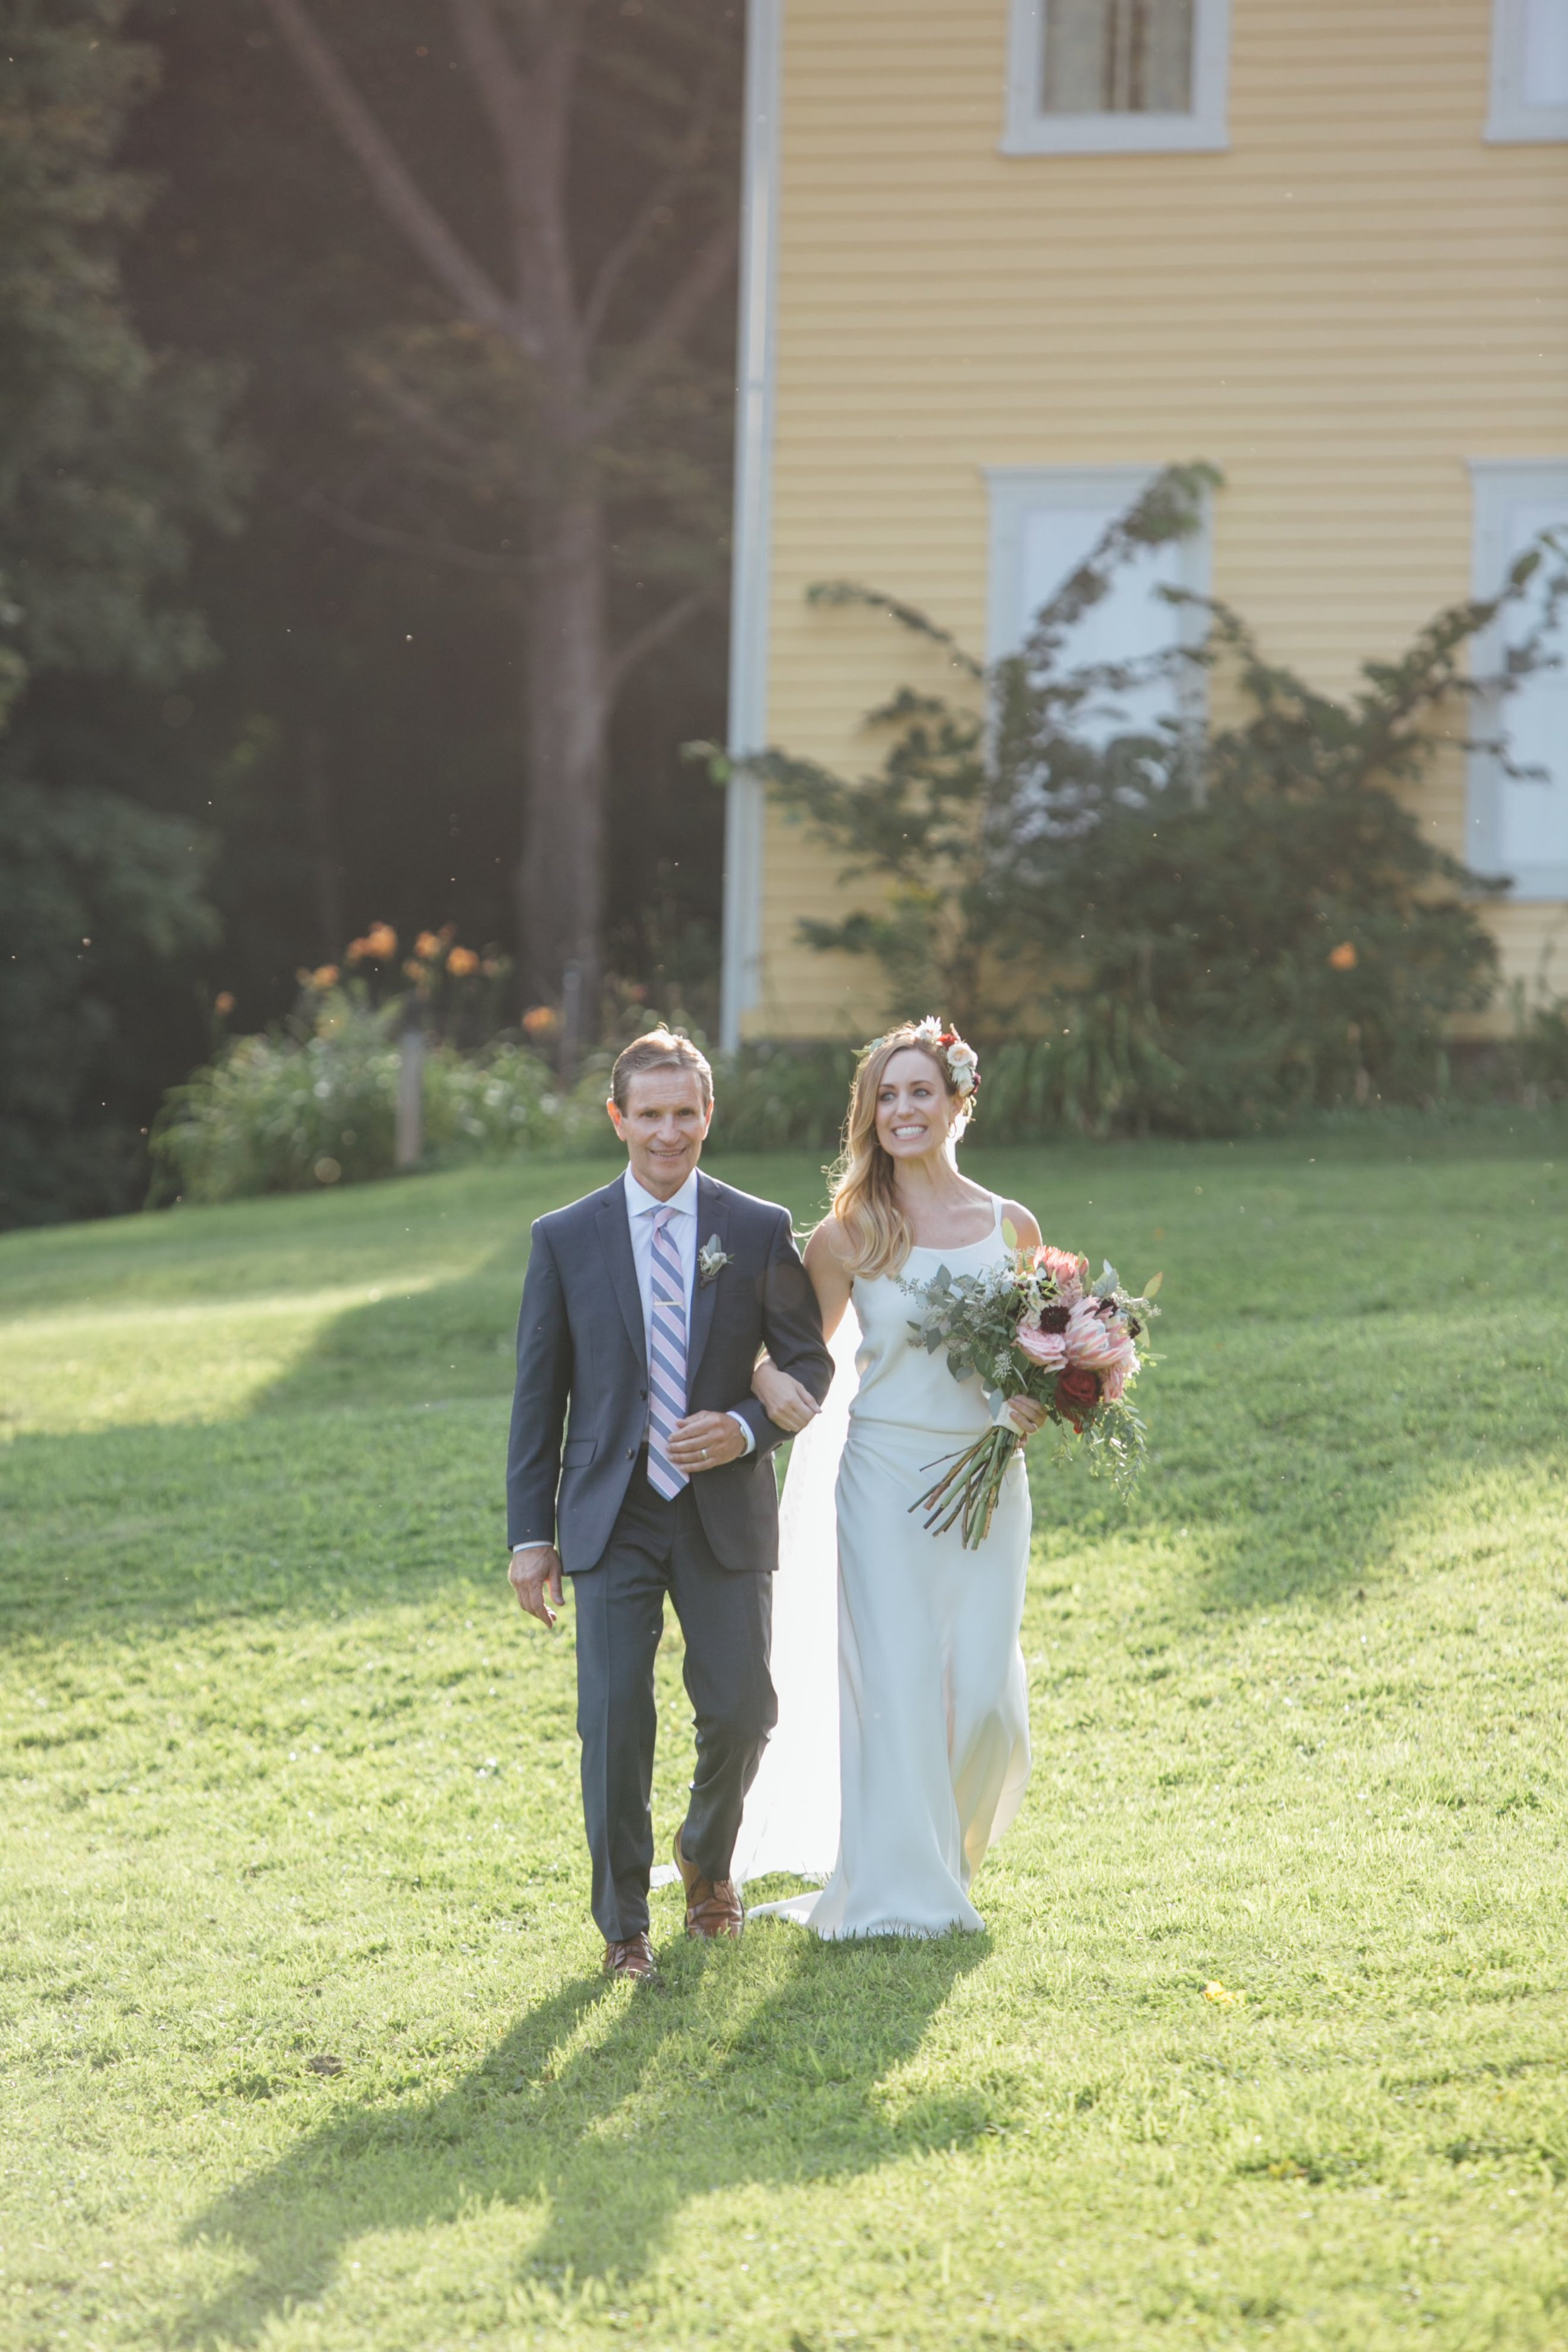 Courtney + Matt Blenheim Hill Farm Catskills NY Wedding Veronica Lola Photography 2017-370.jpg